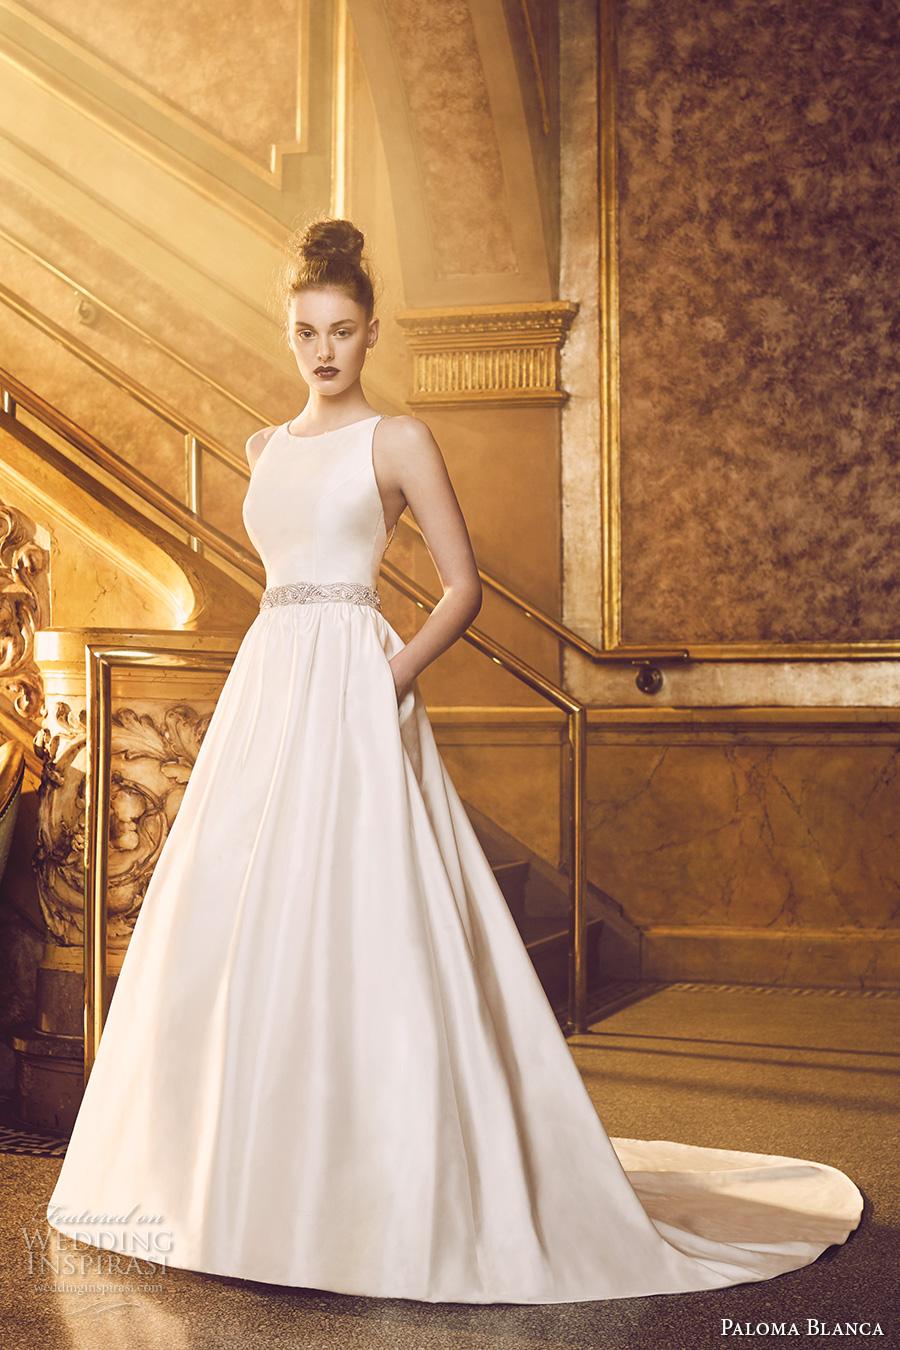 Paloma Blanca Wedding Dresses For Sale 15 Awesome paloma blanca fall bridal